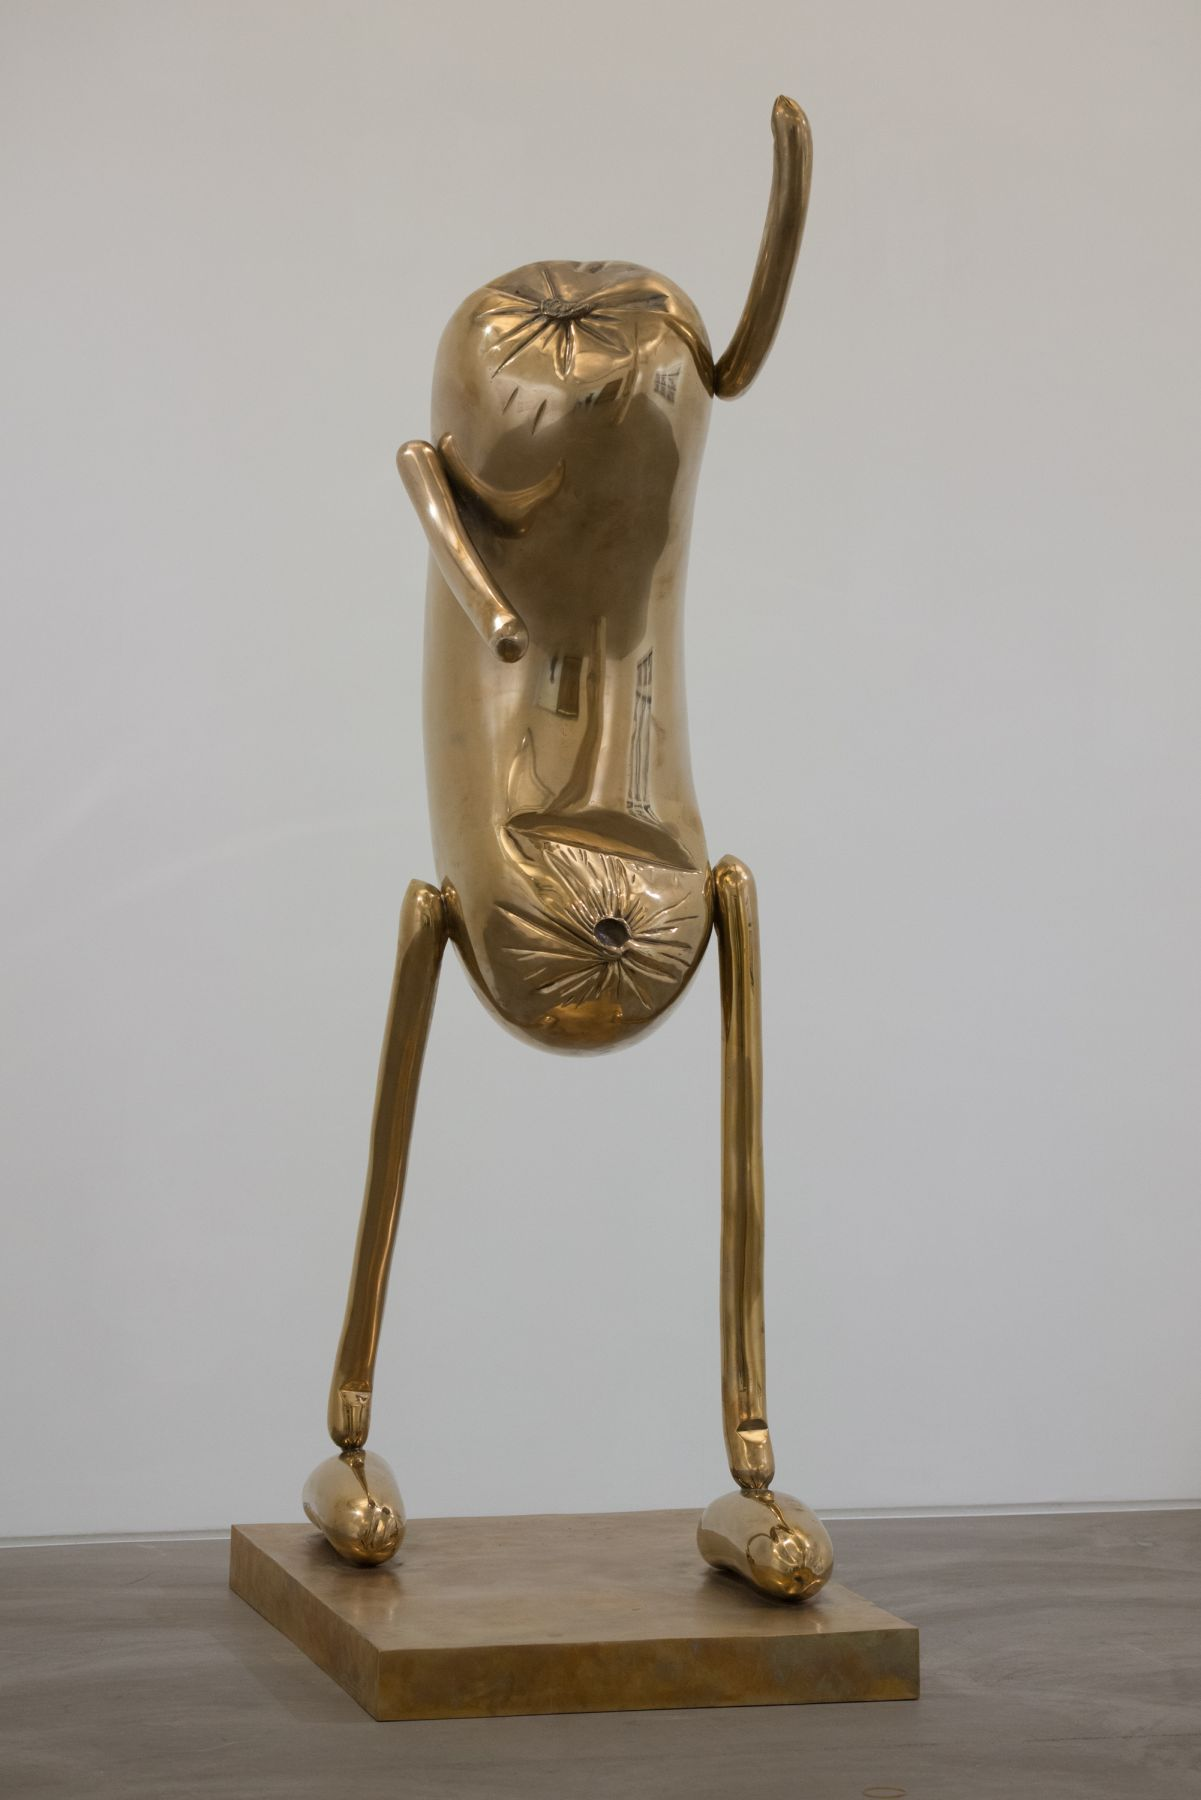 ERWIN WURM Abstract Sculptures (Step), 2014